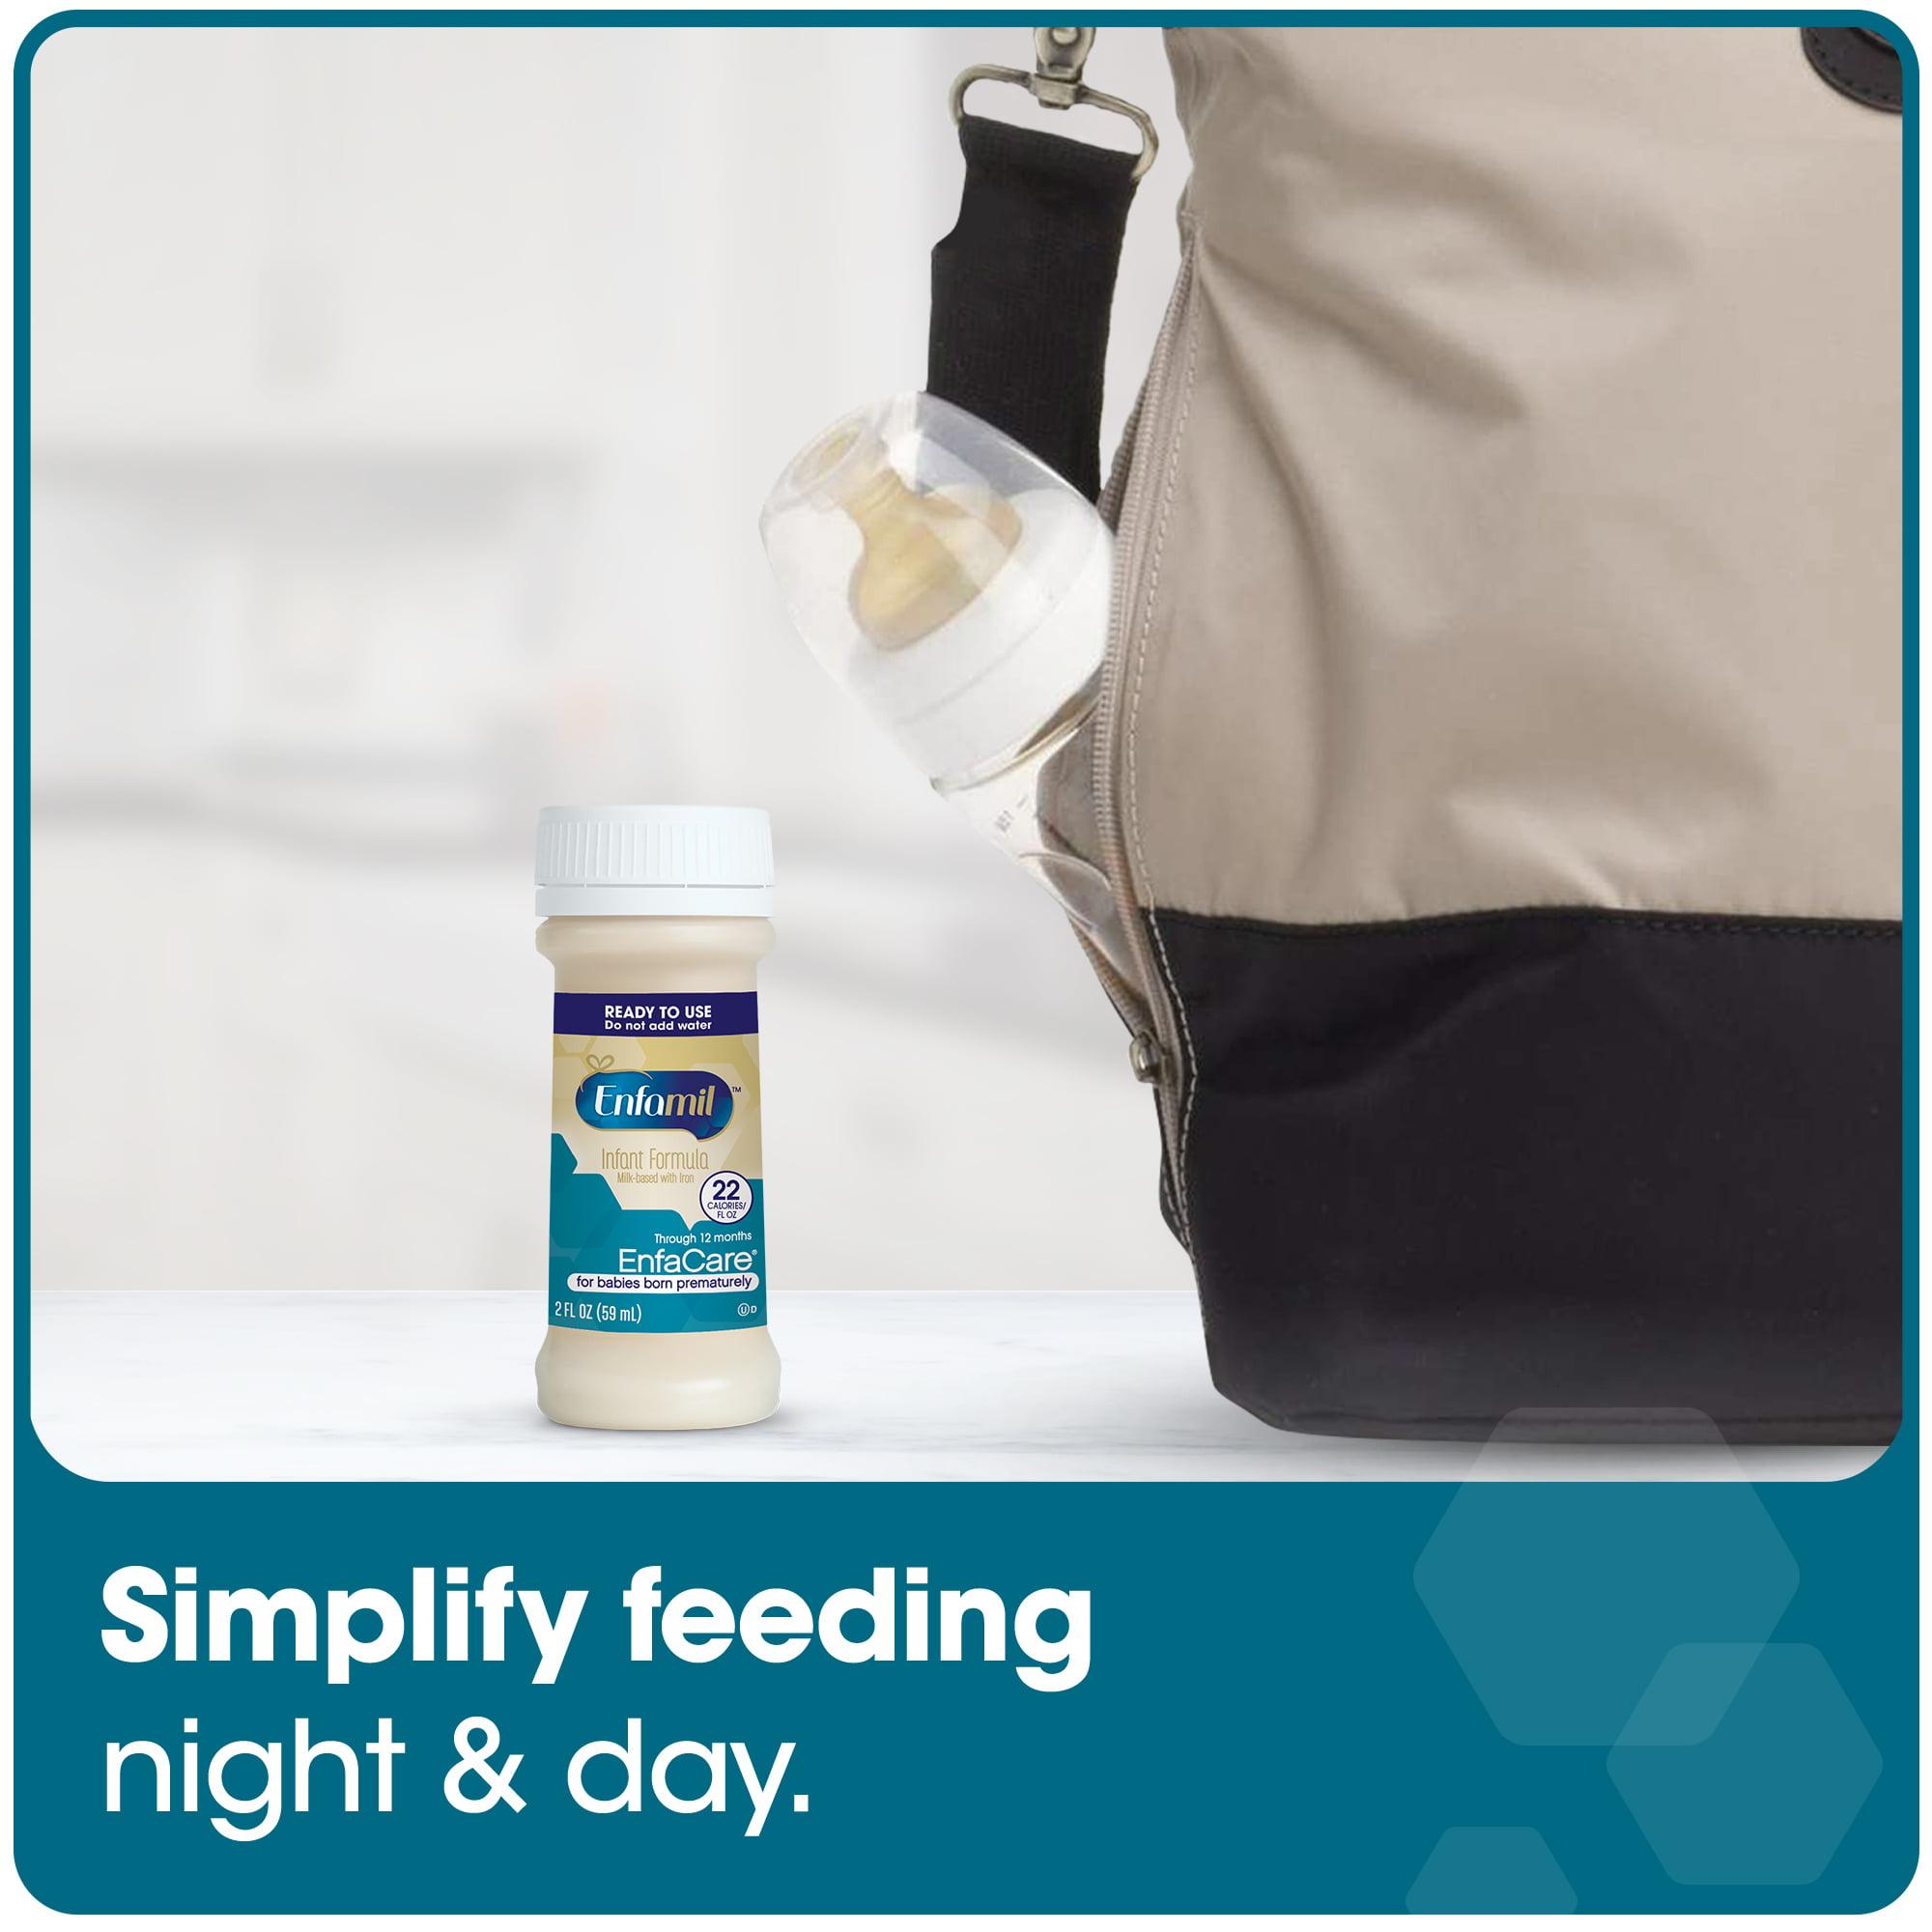 Enfamil EnfaCare Baby Formula 2fl oz Ready to Use Nursette Bottles